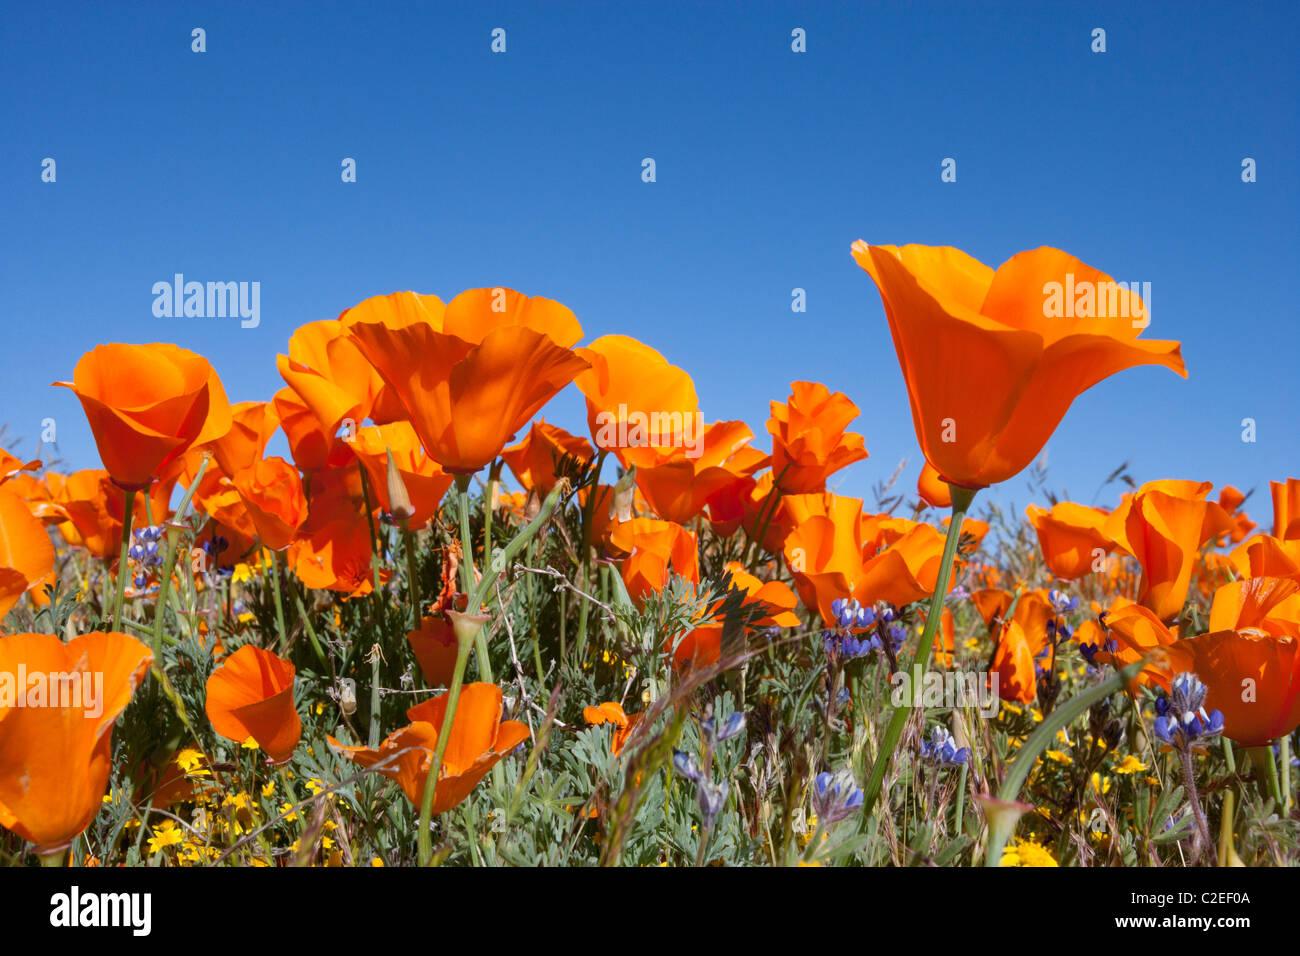 California Poppies - Stock Image